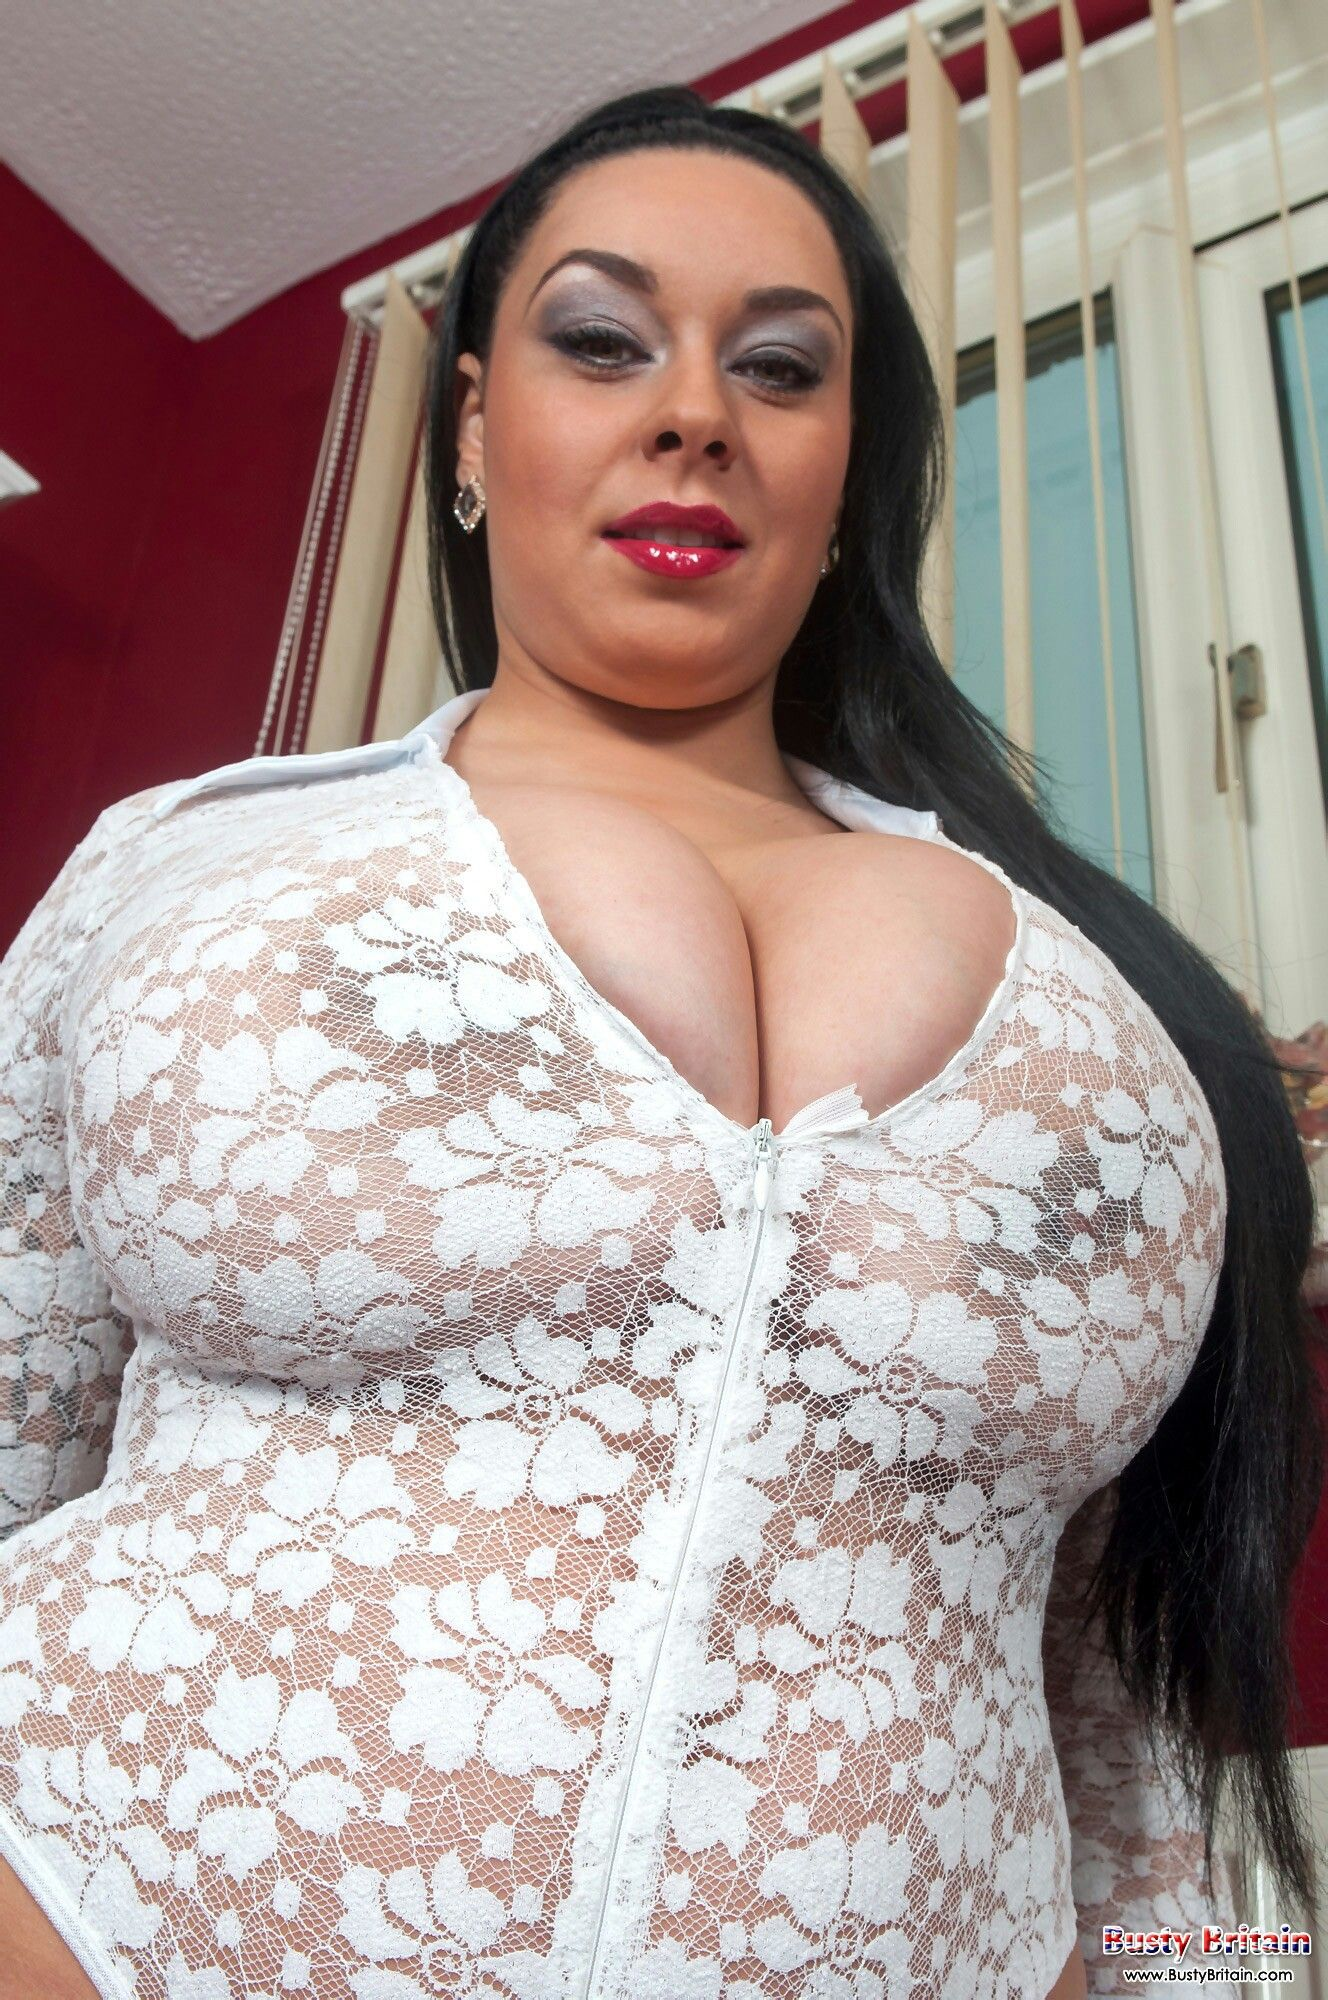 pinsks on bbw boobs | pinterest | boobs and woman